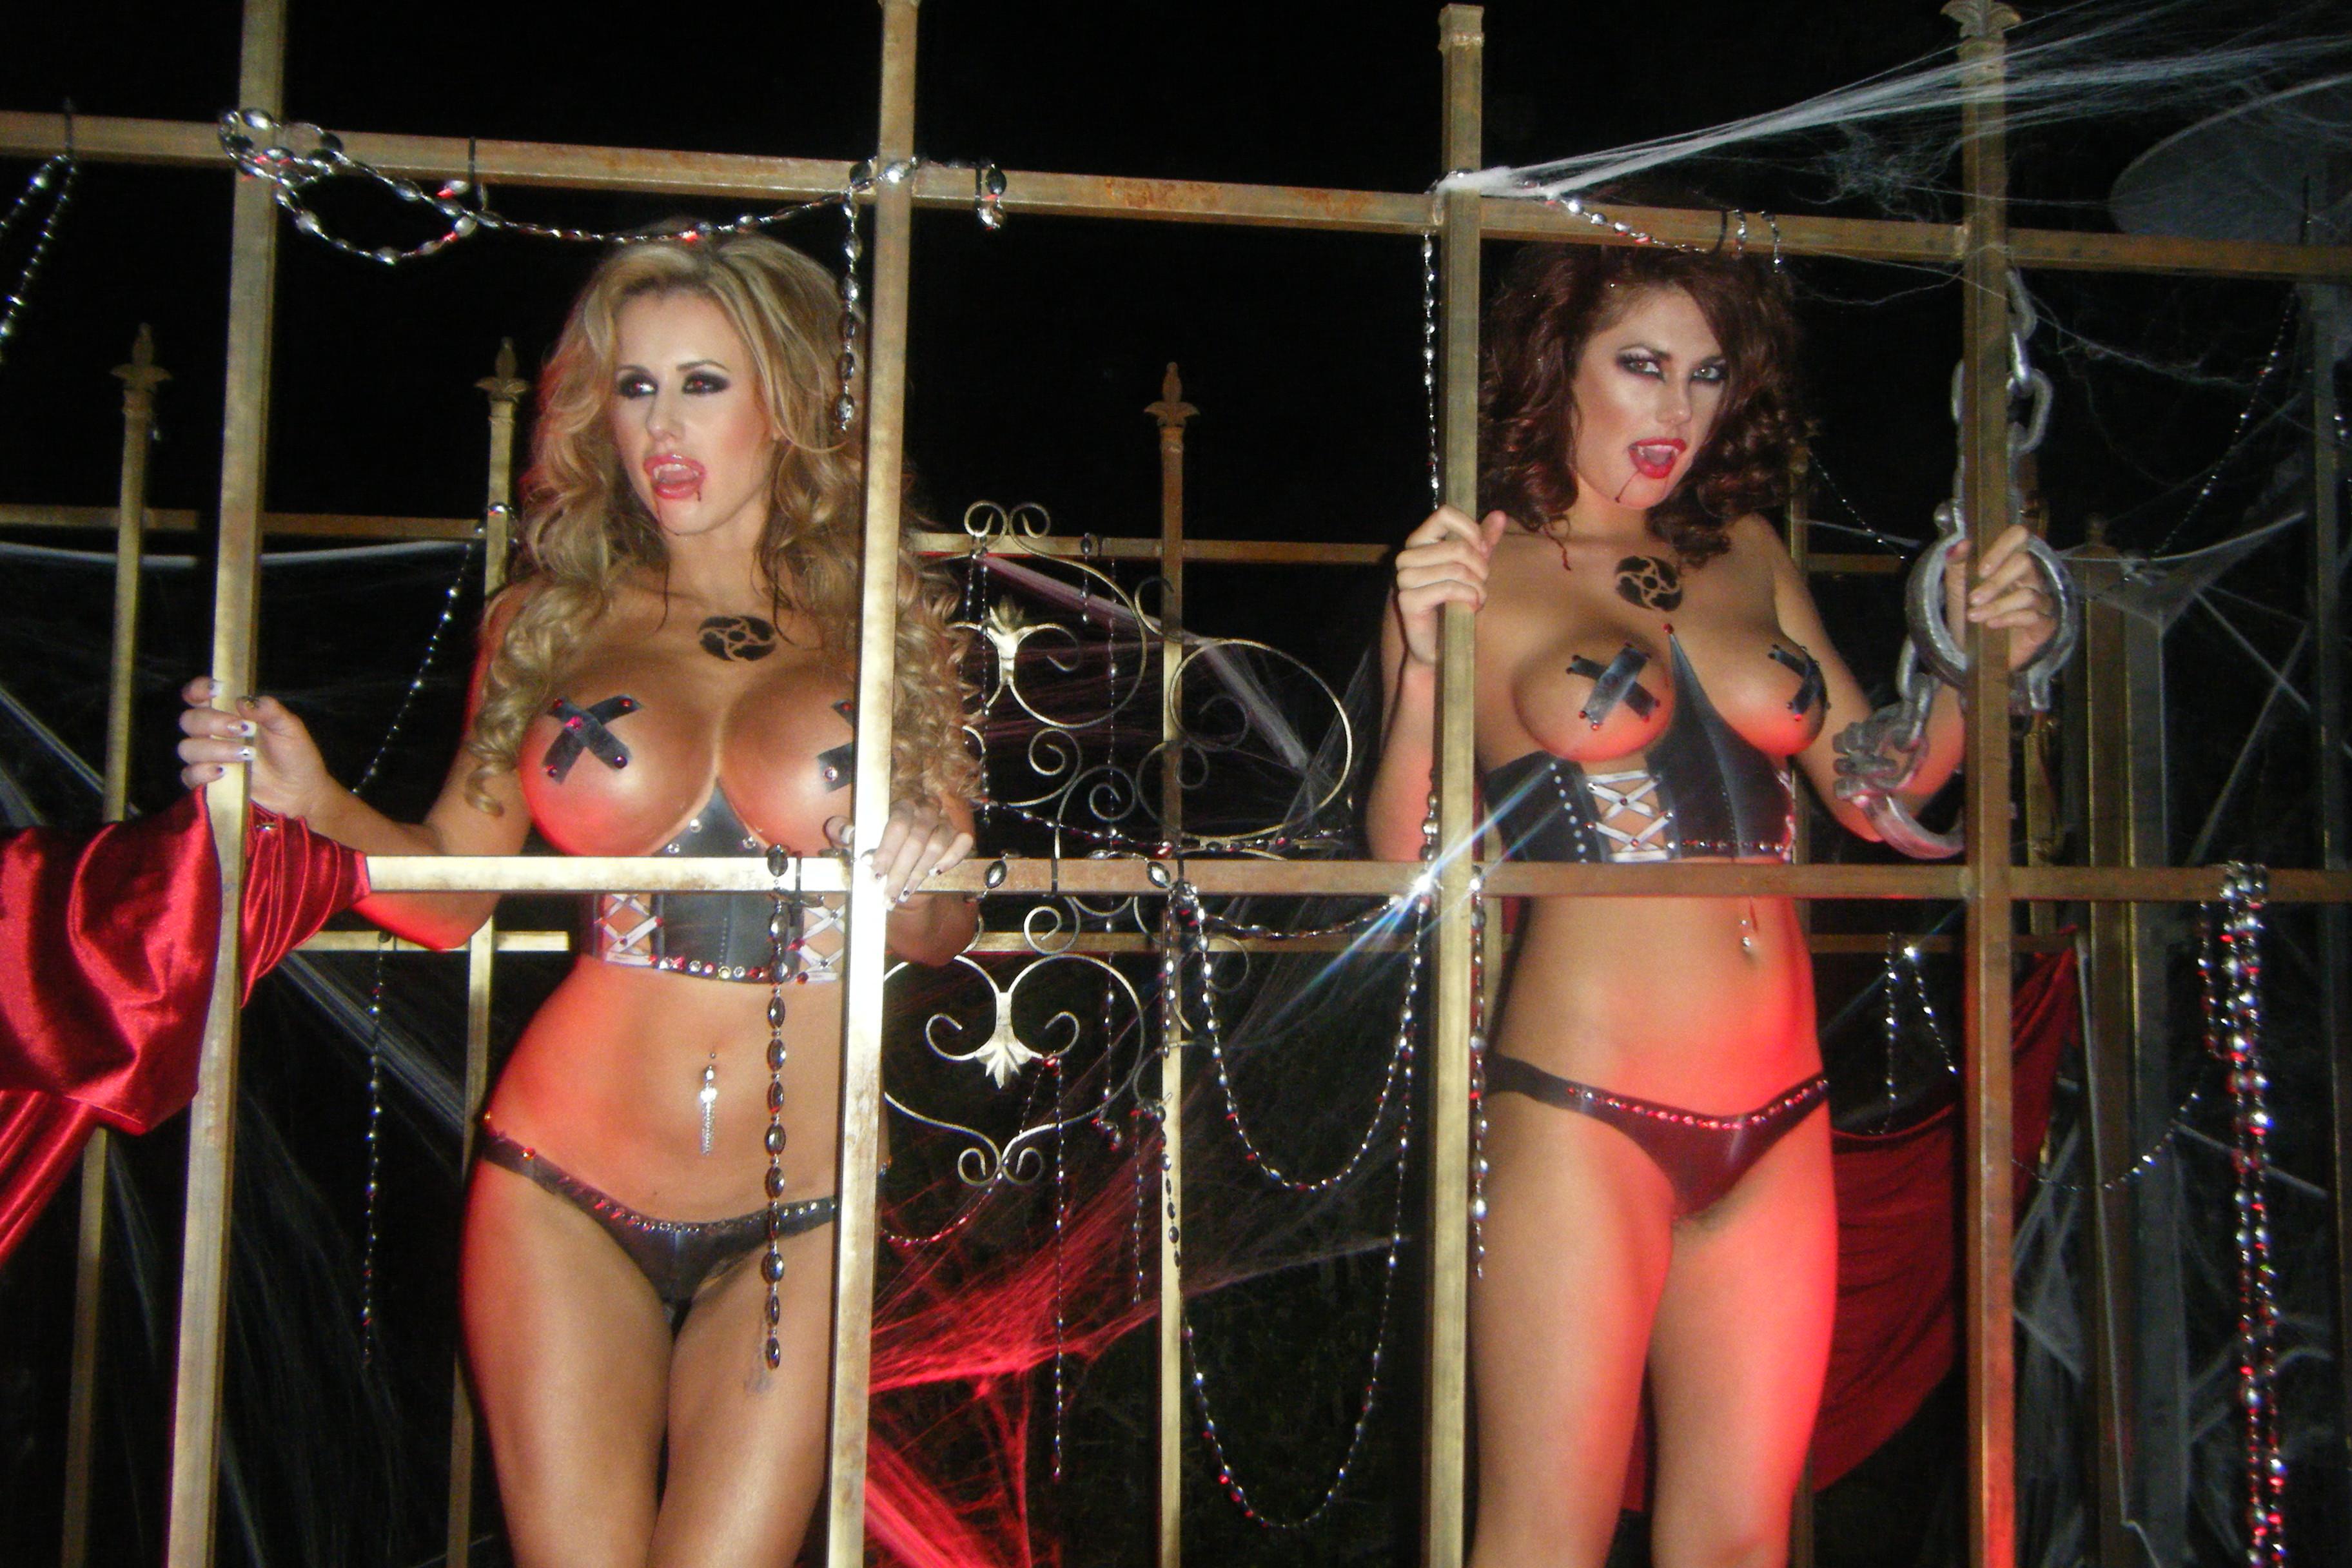 Sexy nude playboy mansion girls nsfw wemen